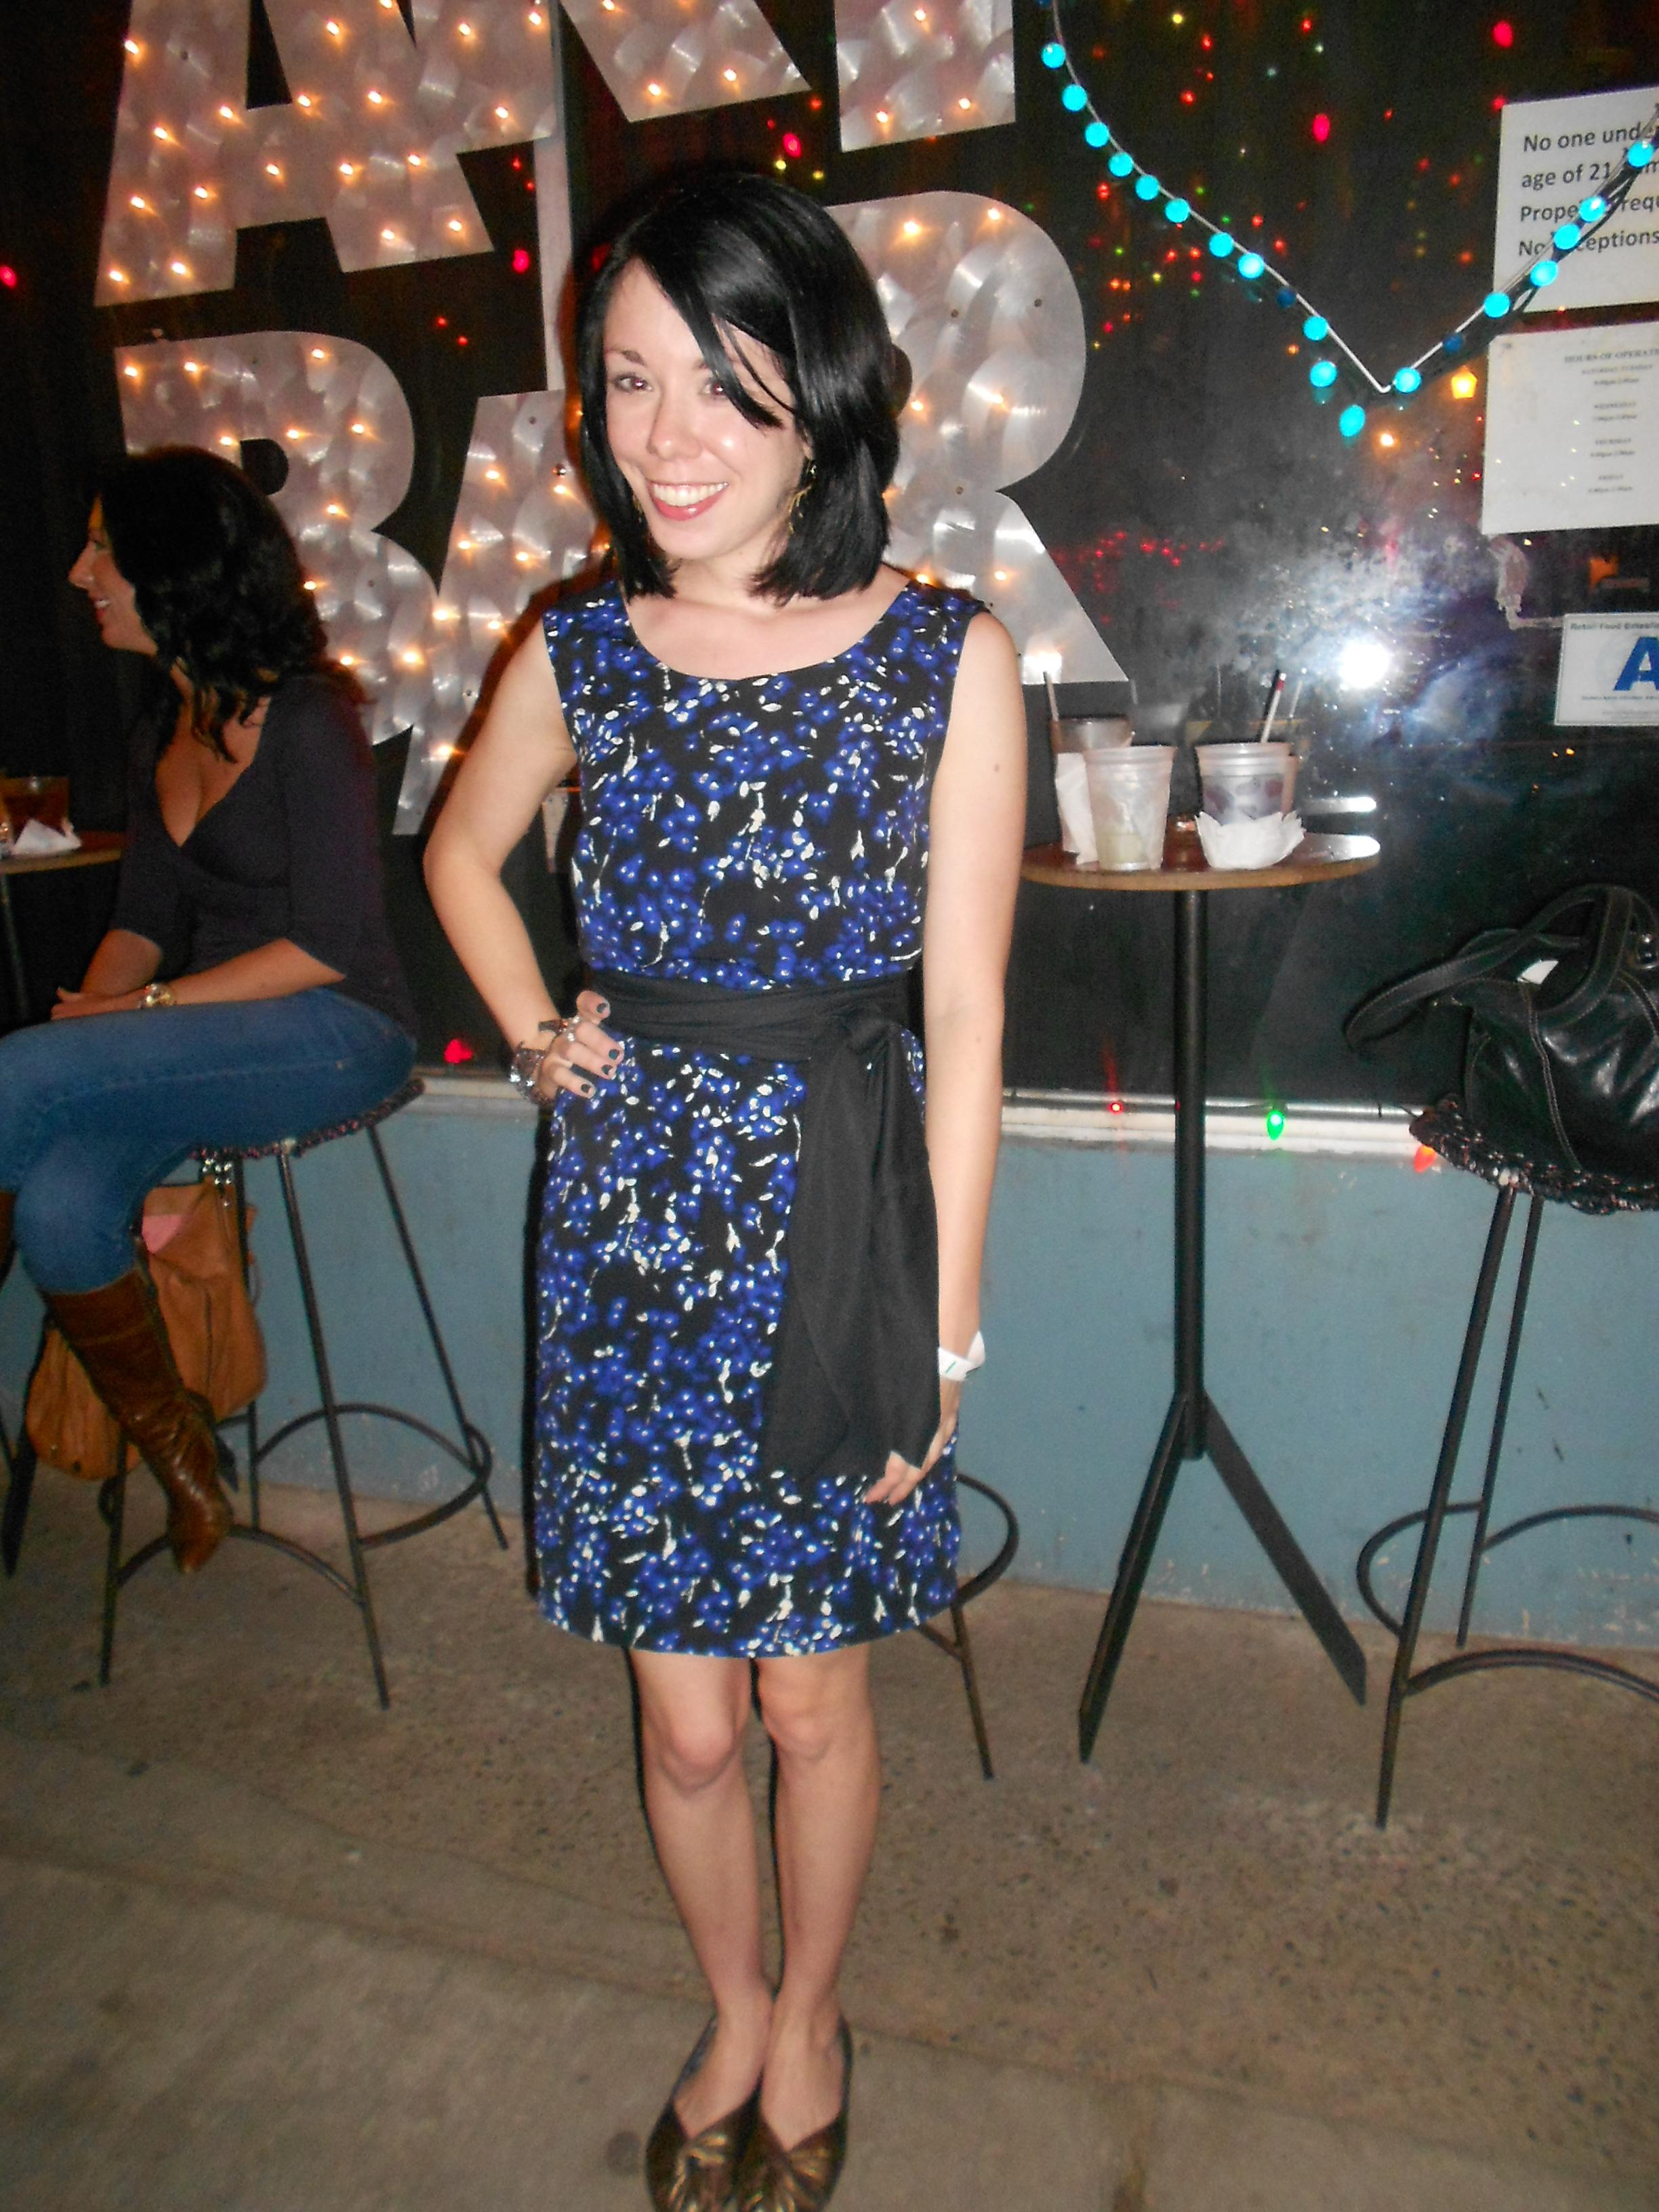 Day 267: Jackson Pollock Dress 6